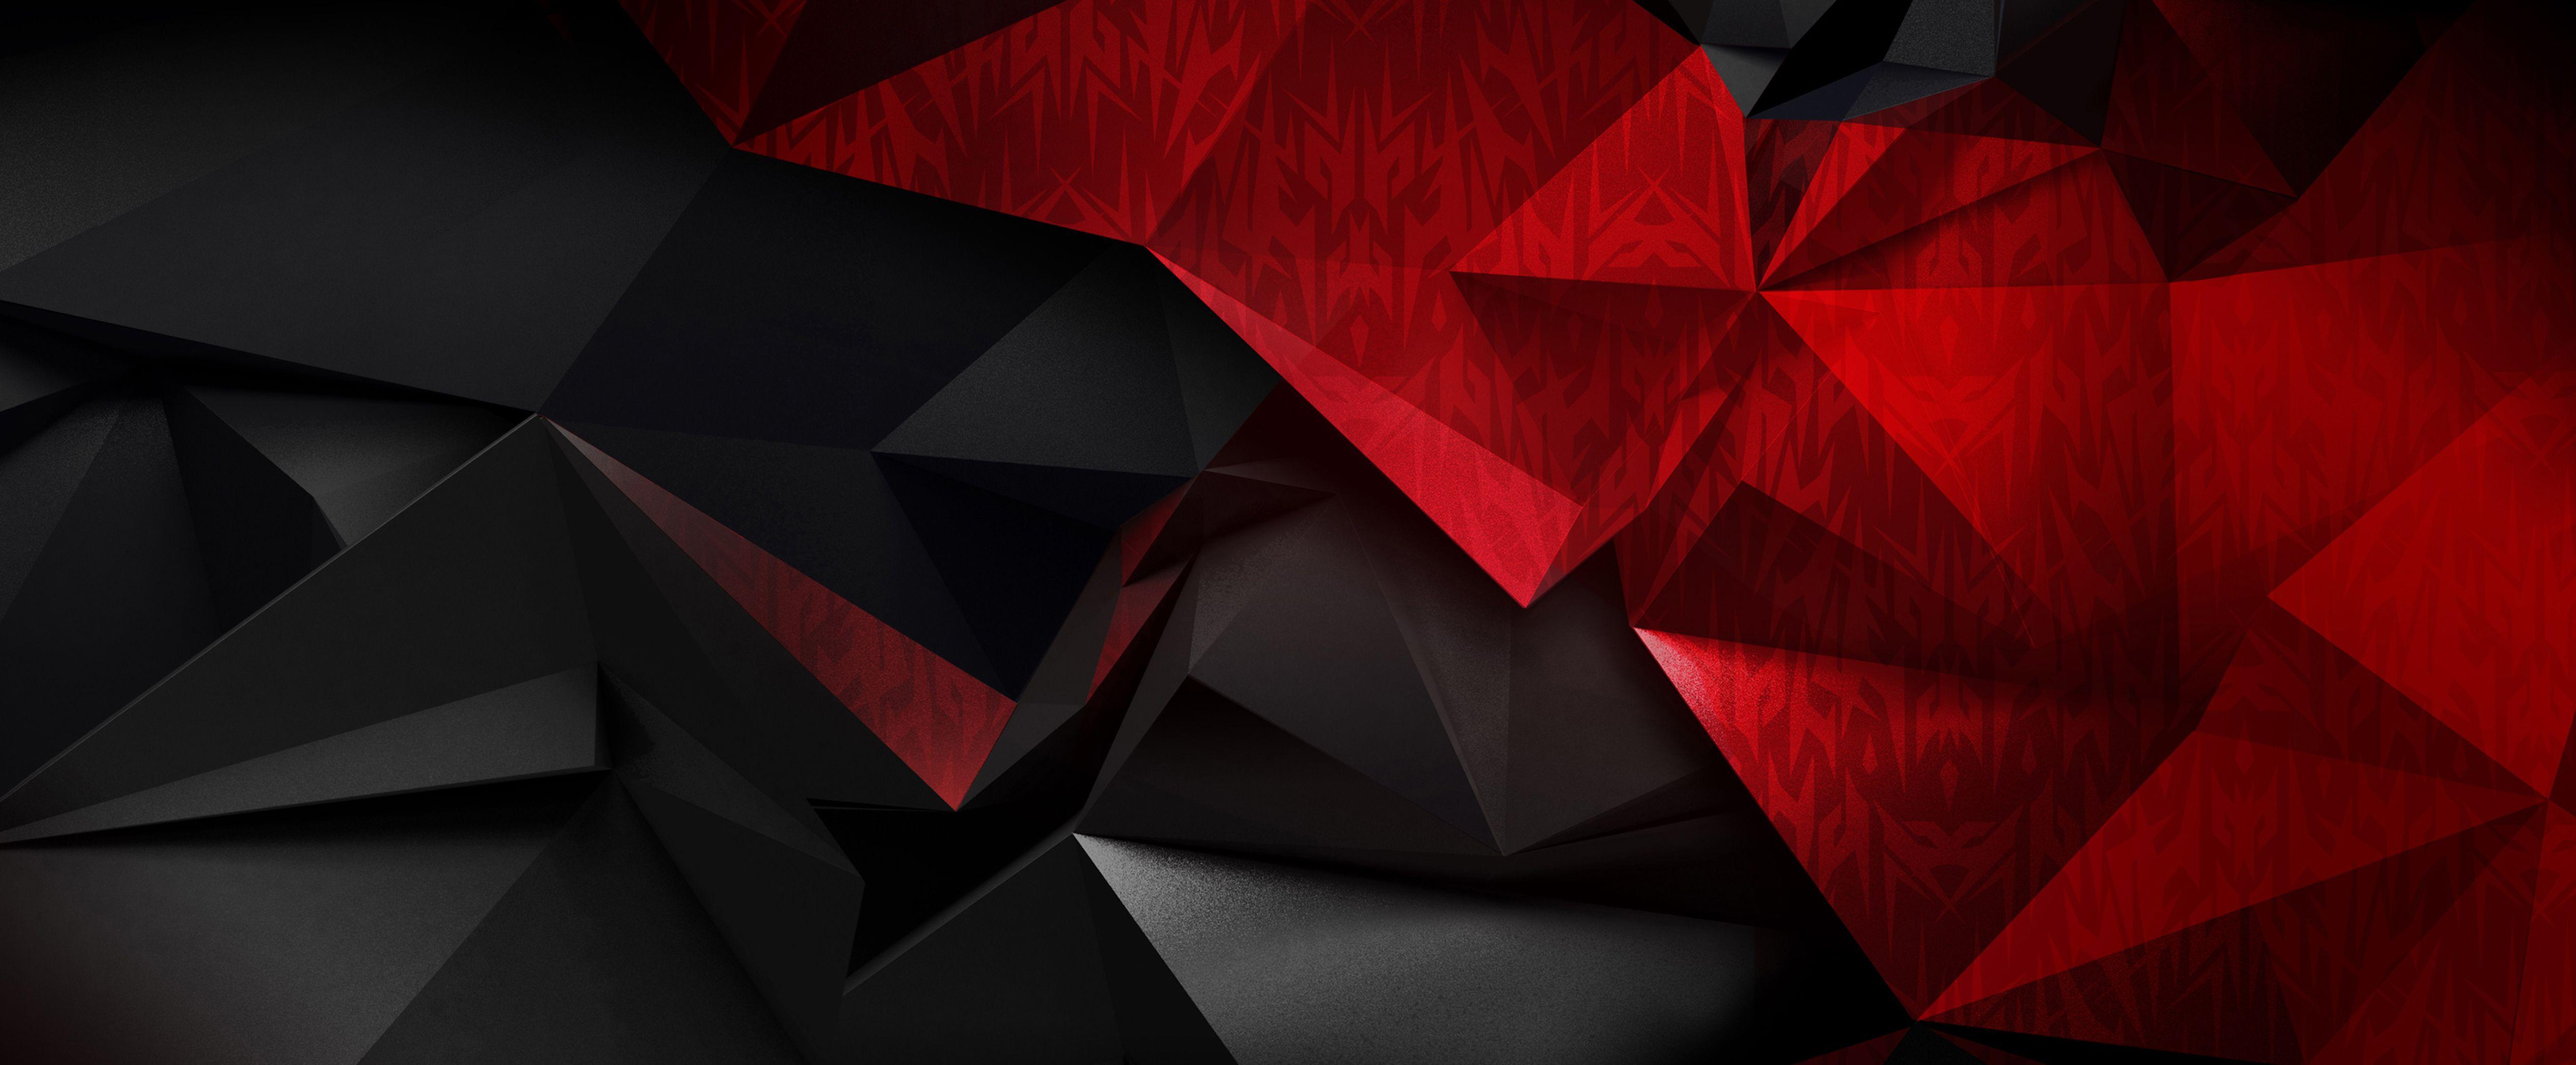 Acer Predator Wallpaper Red Original Red Background Images Gaming Wallpapers Hd Red Background